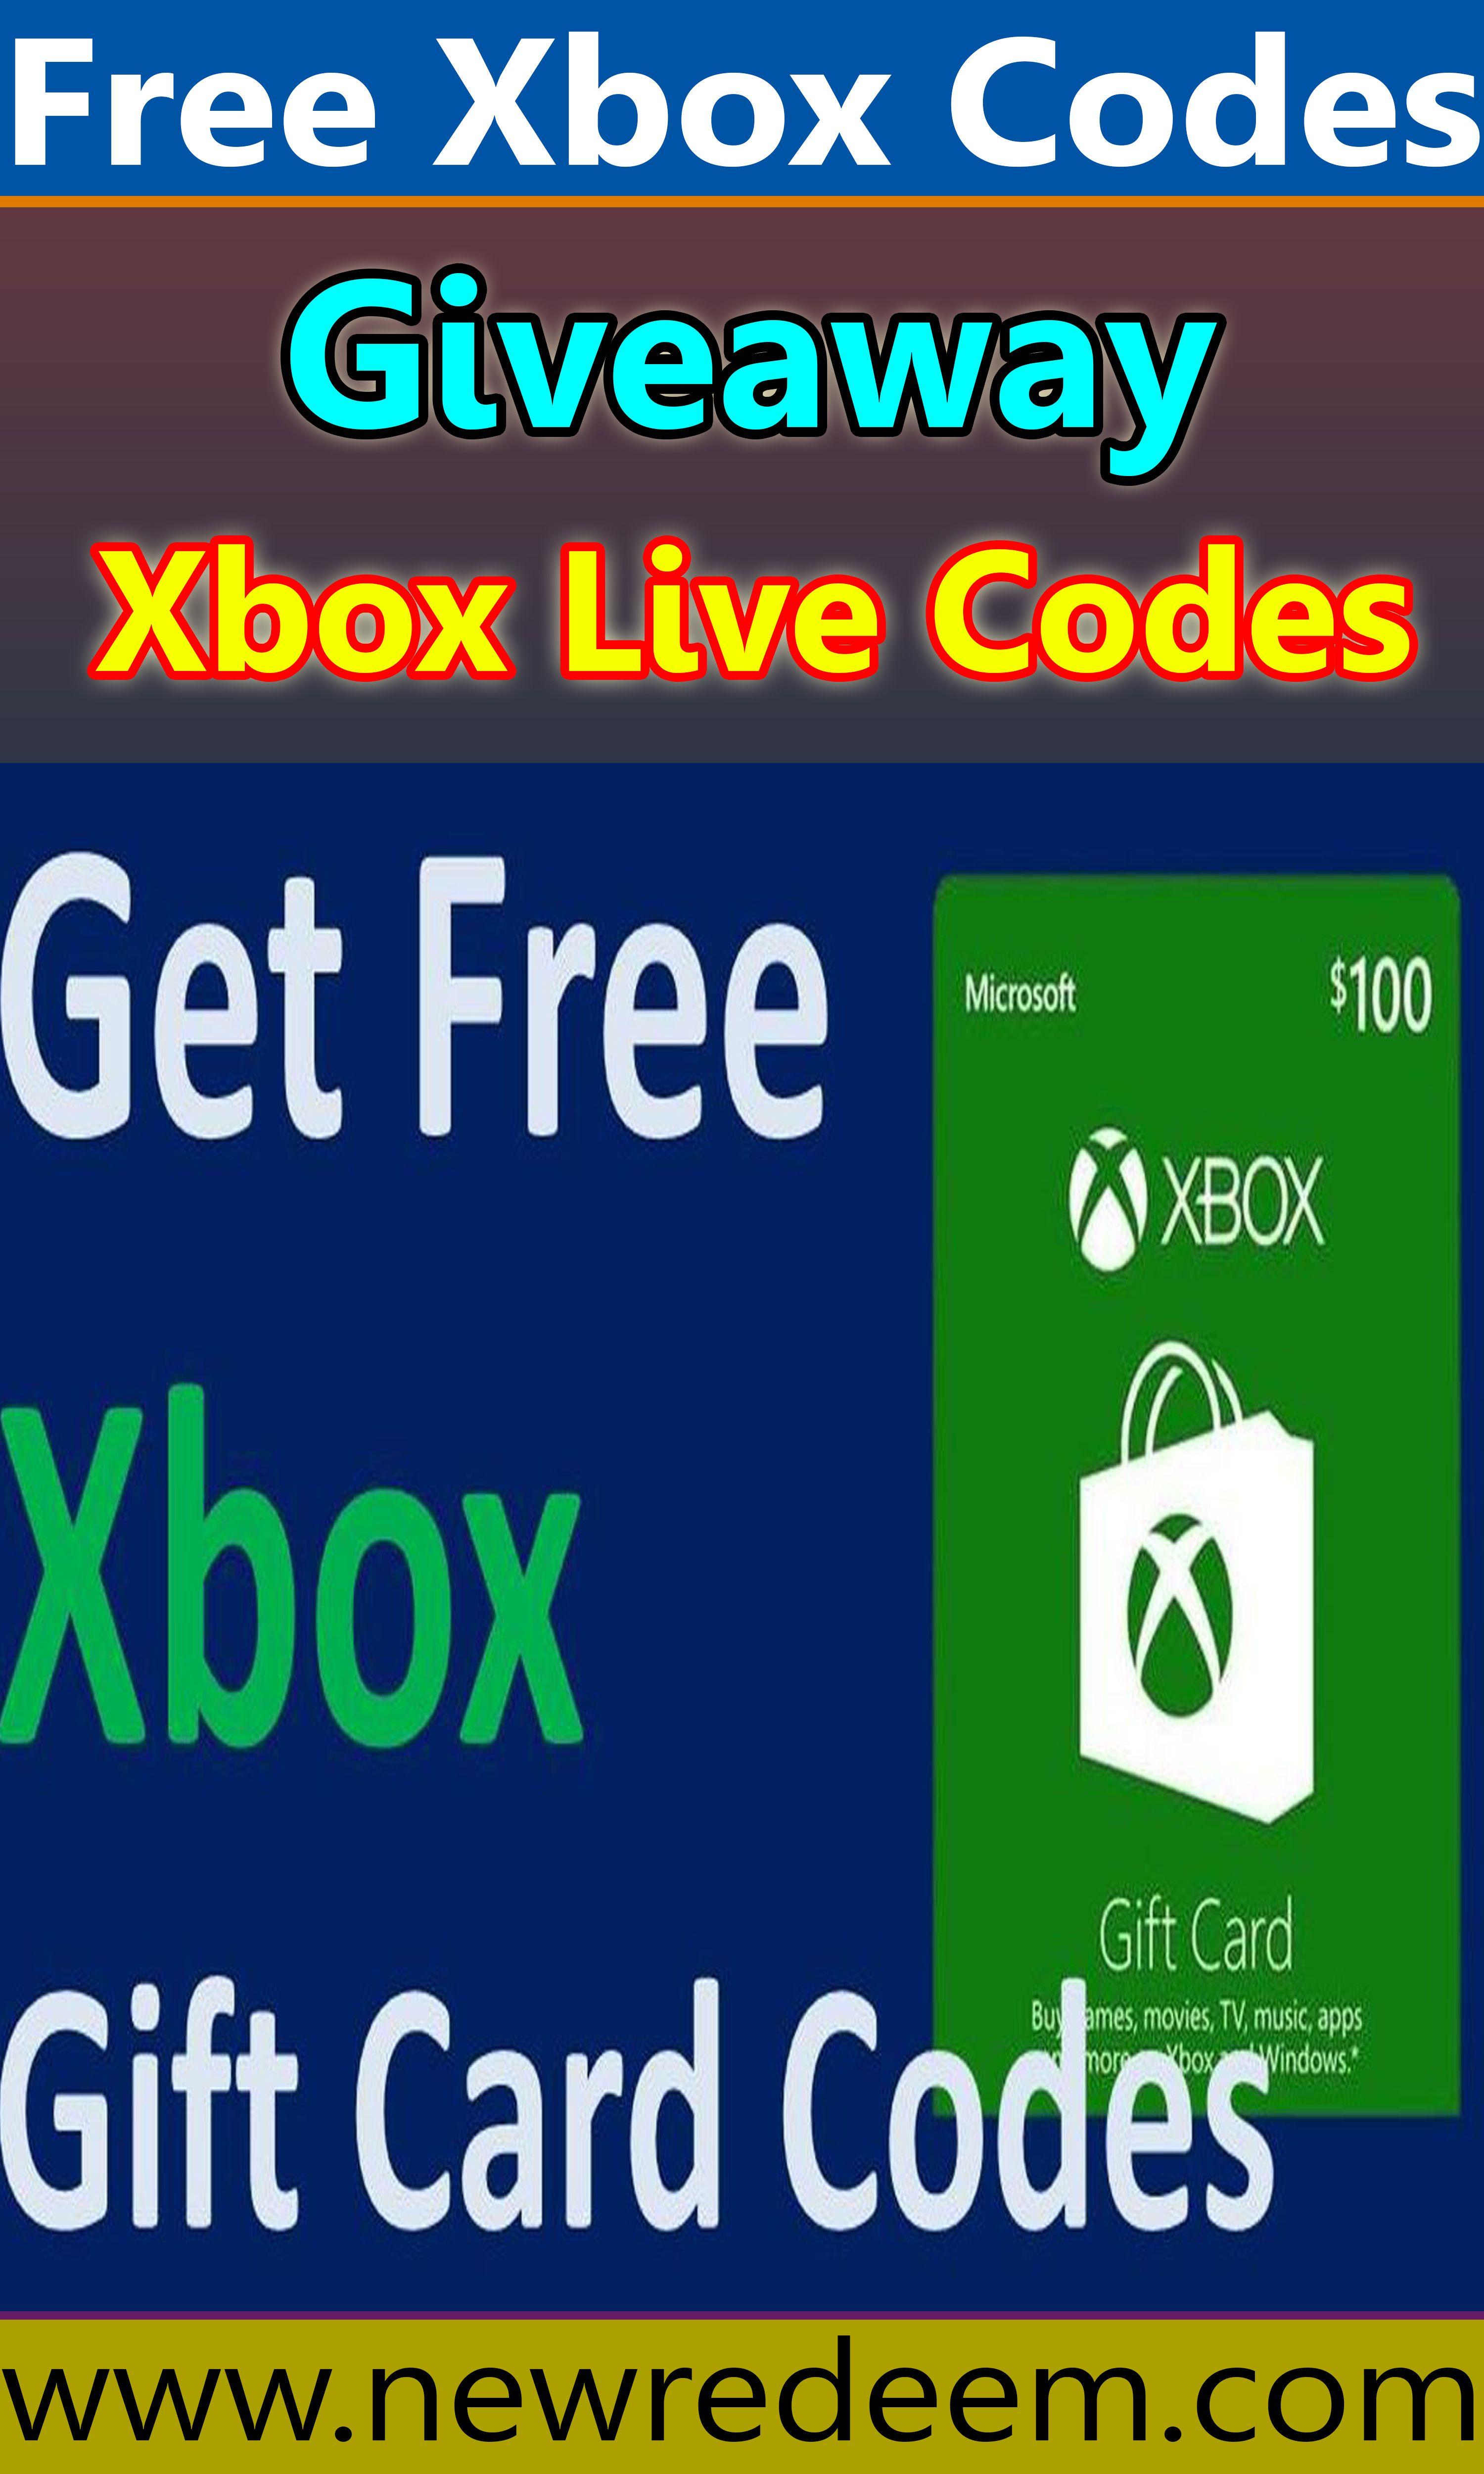 Xbox Redeem Code Generator Free Xbox Gift Card Unused Codes 2020